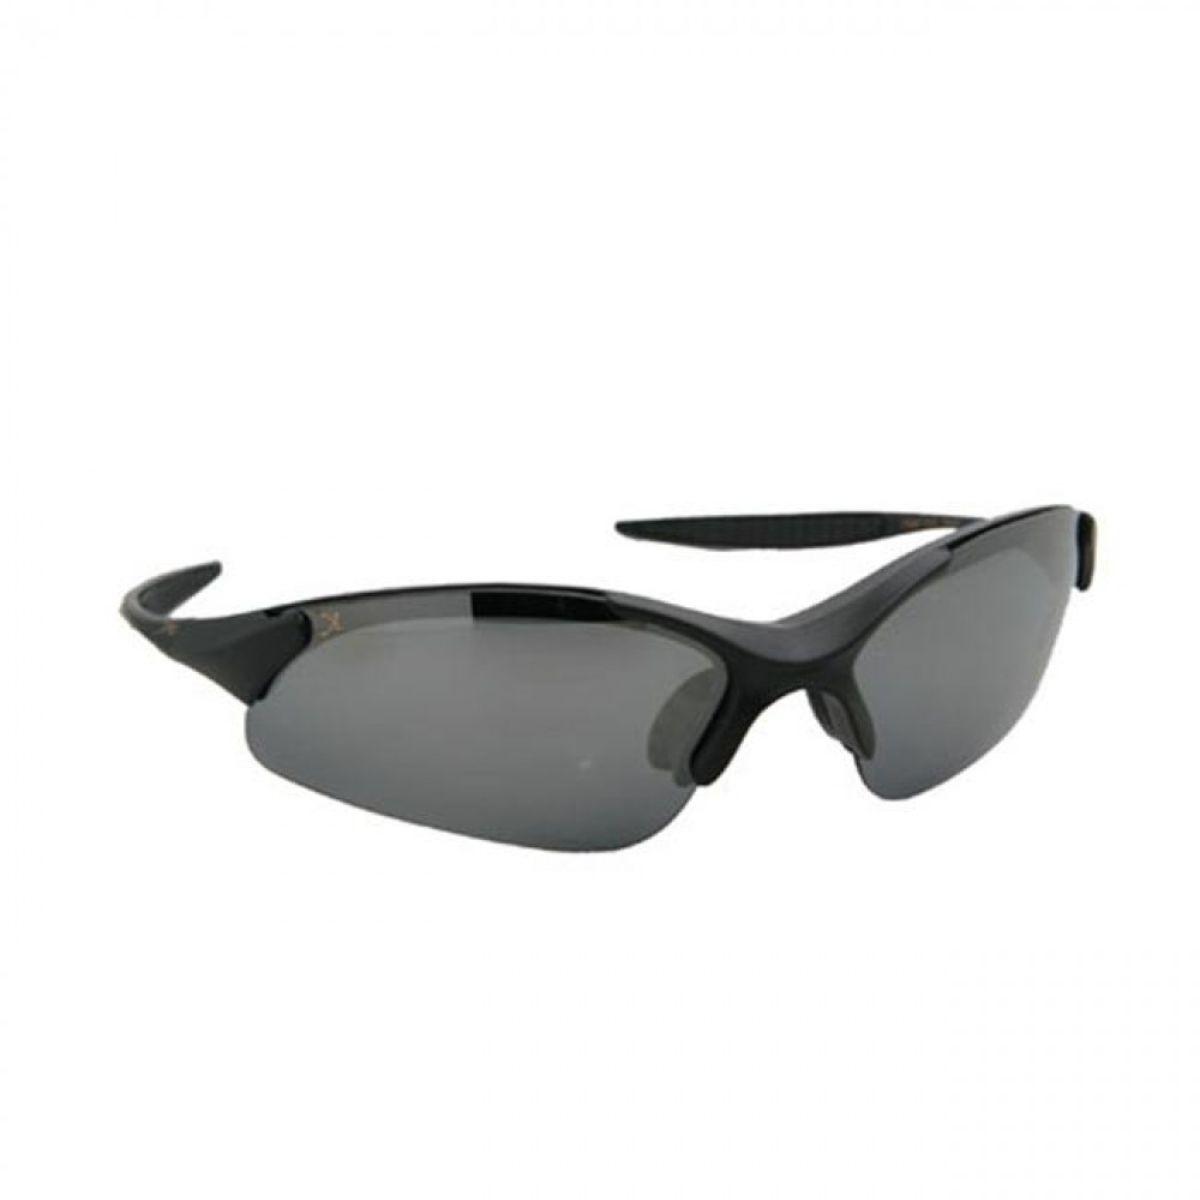 XPO X3667PCP SMOKE Gator Polarized Rimless Sunglasses - Matte Black - Smoke Lens